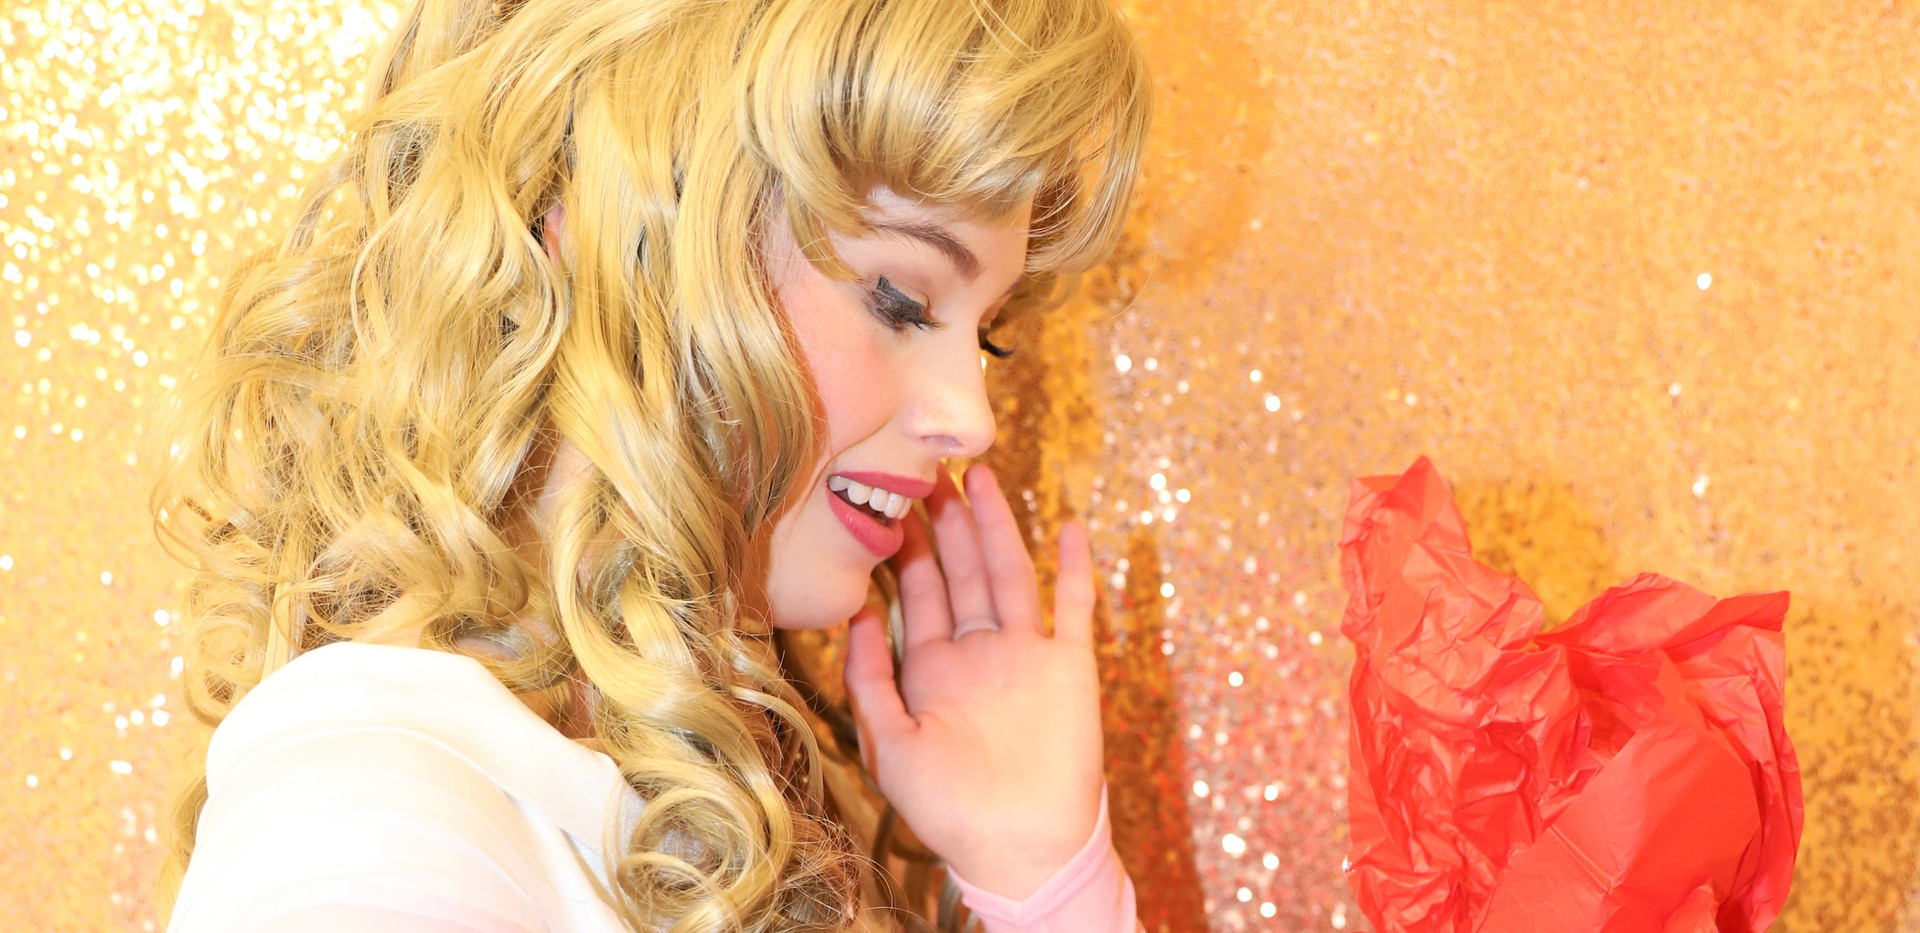 Sleeping Beauty Character Princess Performer Party DC, Maryland, Virginia, Nova Party Princess DMV Enchanted Empowerment